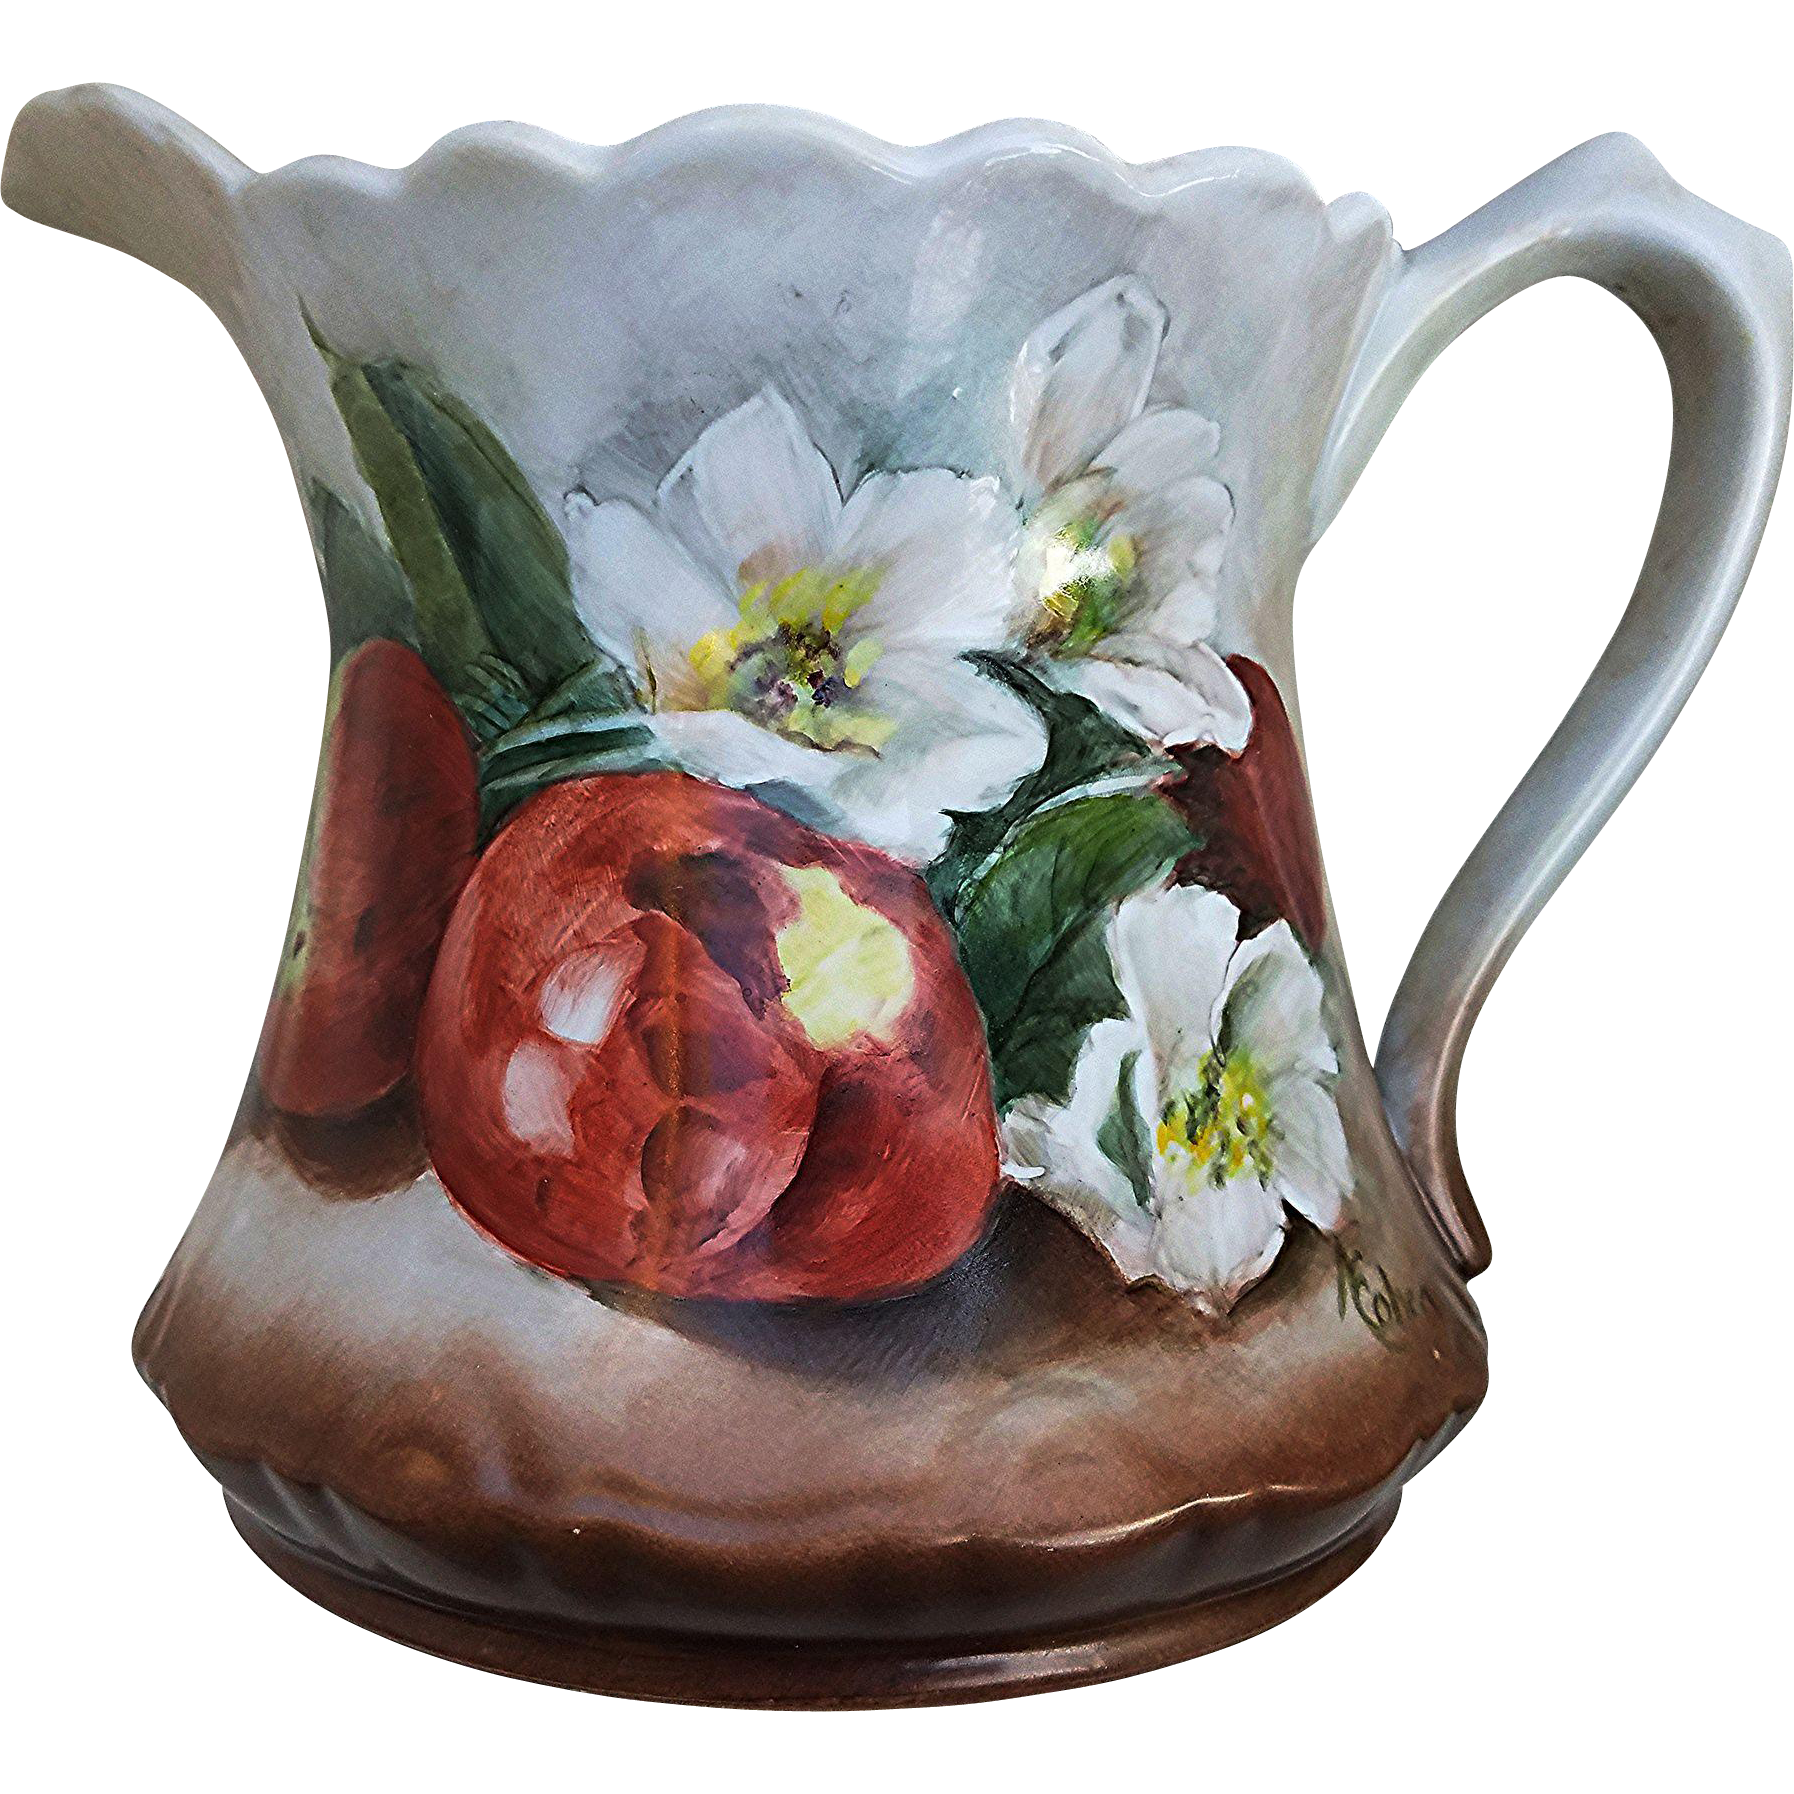 "Gorgeous 1900's Vintage Bavaria Hand Painted ""Apple Blossoms & Apples"" Fruit Decor 7-1/4"" Cider Pitcher by the Artist, ""K. Cohen"""